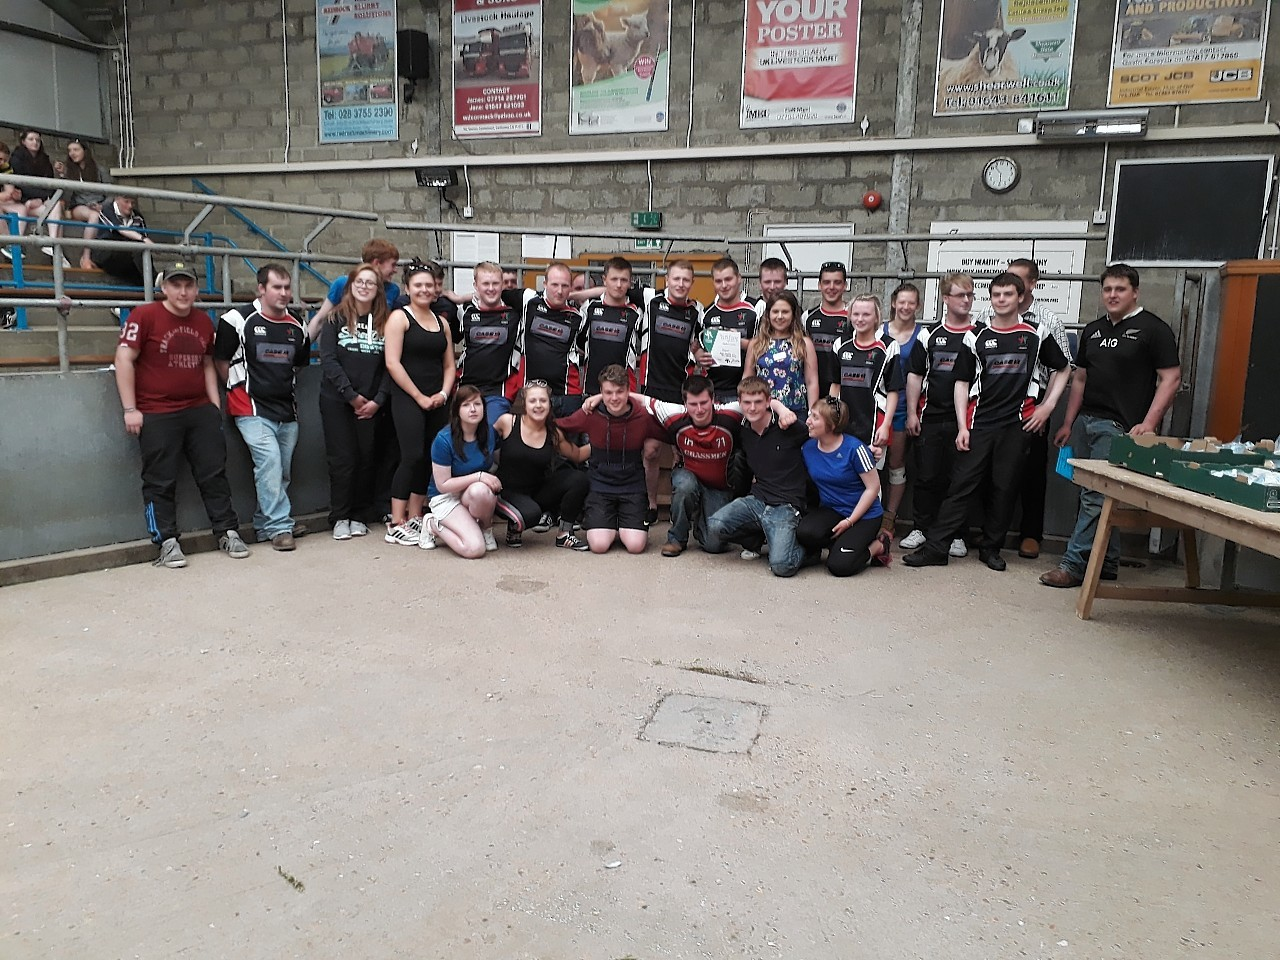 The winning team from Bower YFC